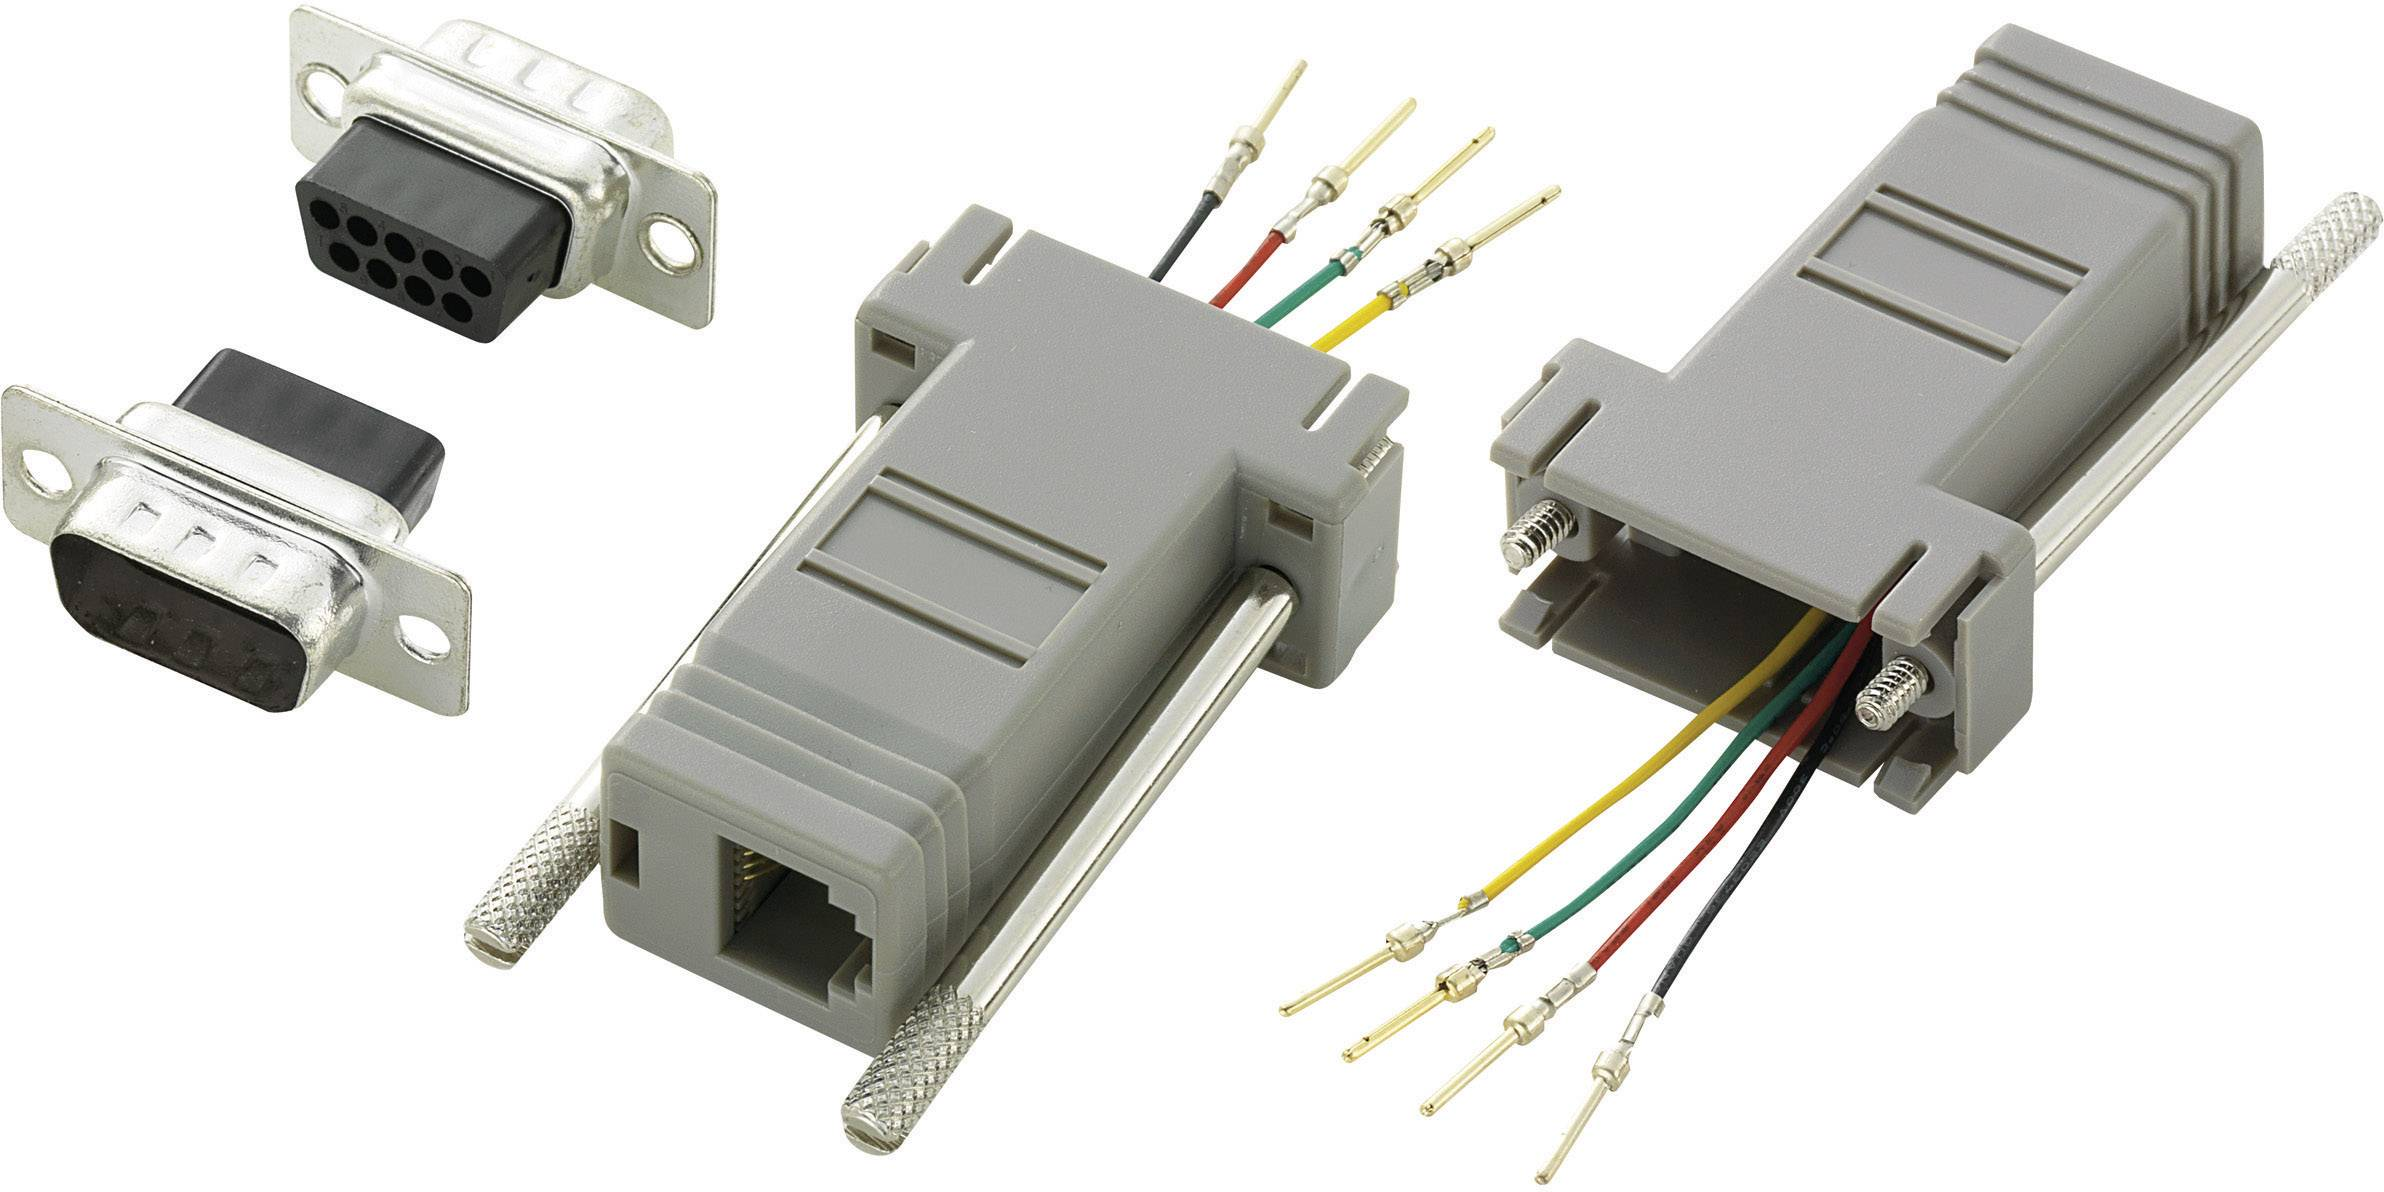 D-SUB adaptér D-SUB zástrčka 9pólová - RJ11 zásuvka Conrad Components 1 ks